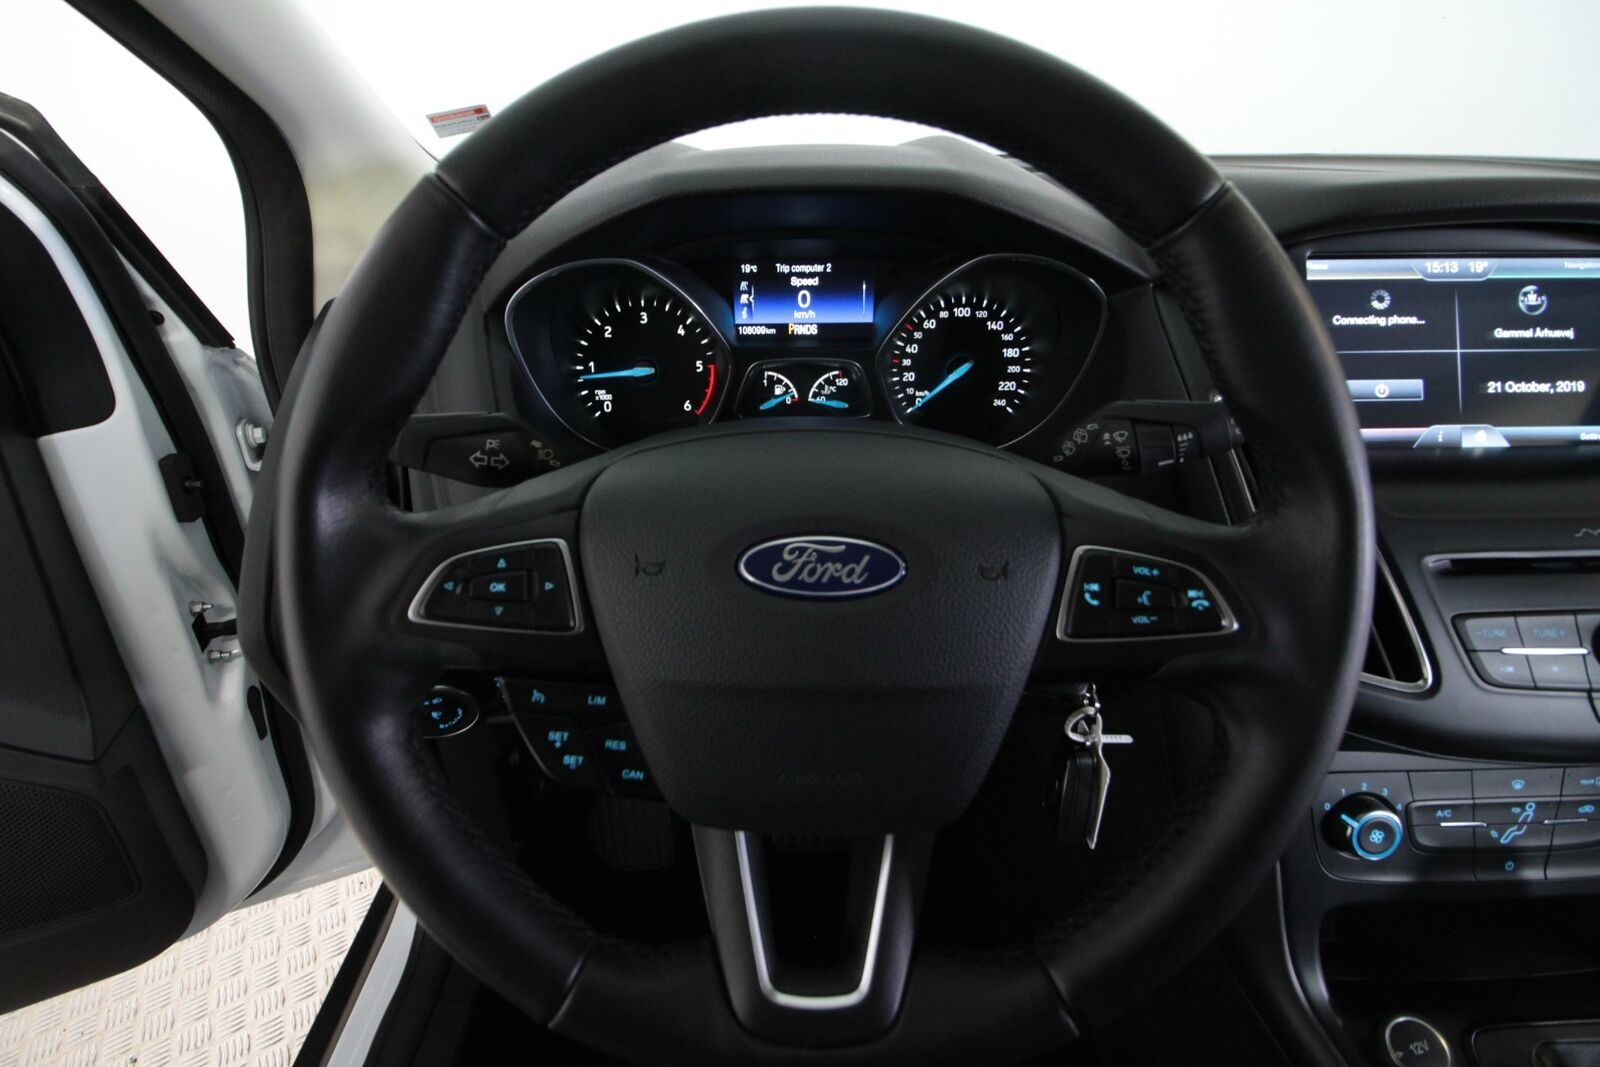 Ford Focus TDCi 120 Business stc. aut.